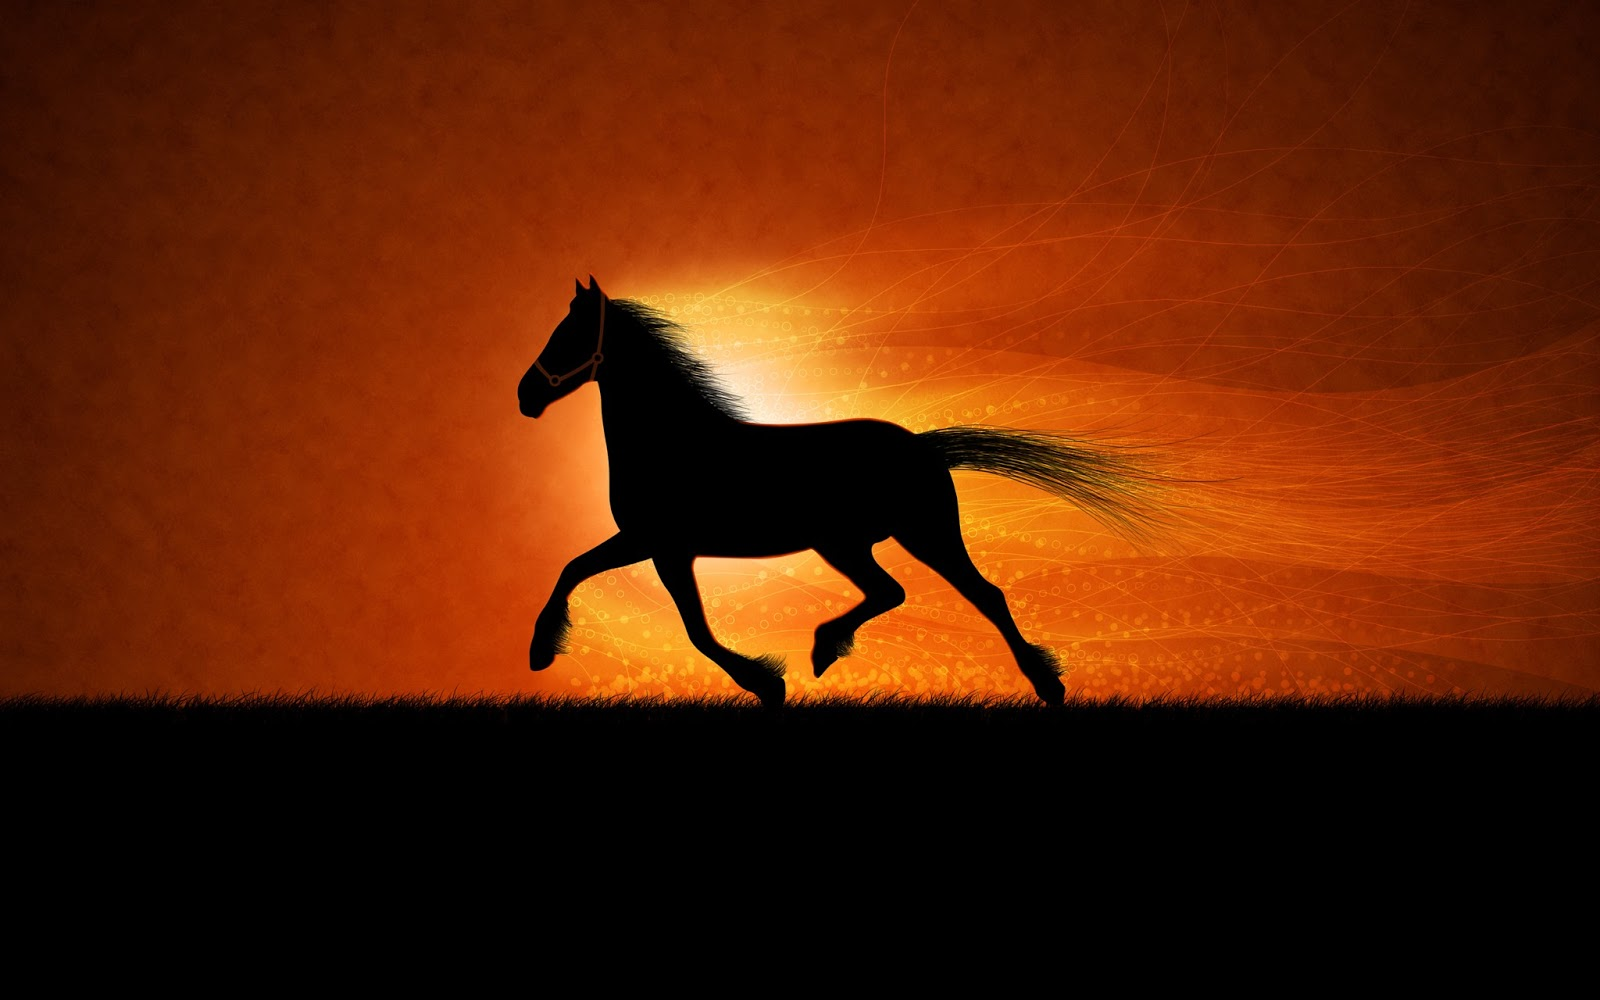 Popular   Wallpaper Horse Nightmare - running+horse+hd+wallpaper+free  You Should Have_76755.jpg